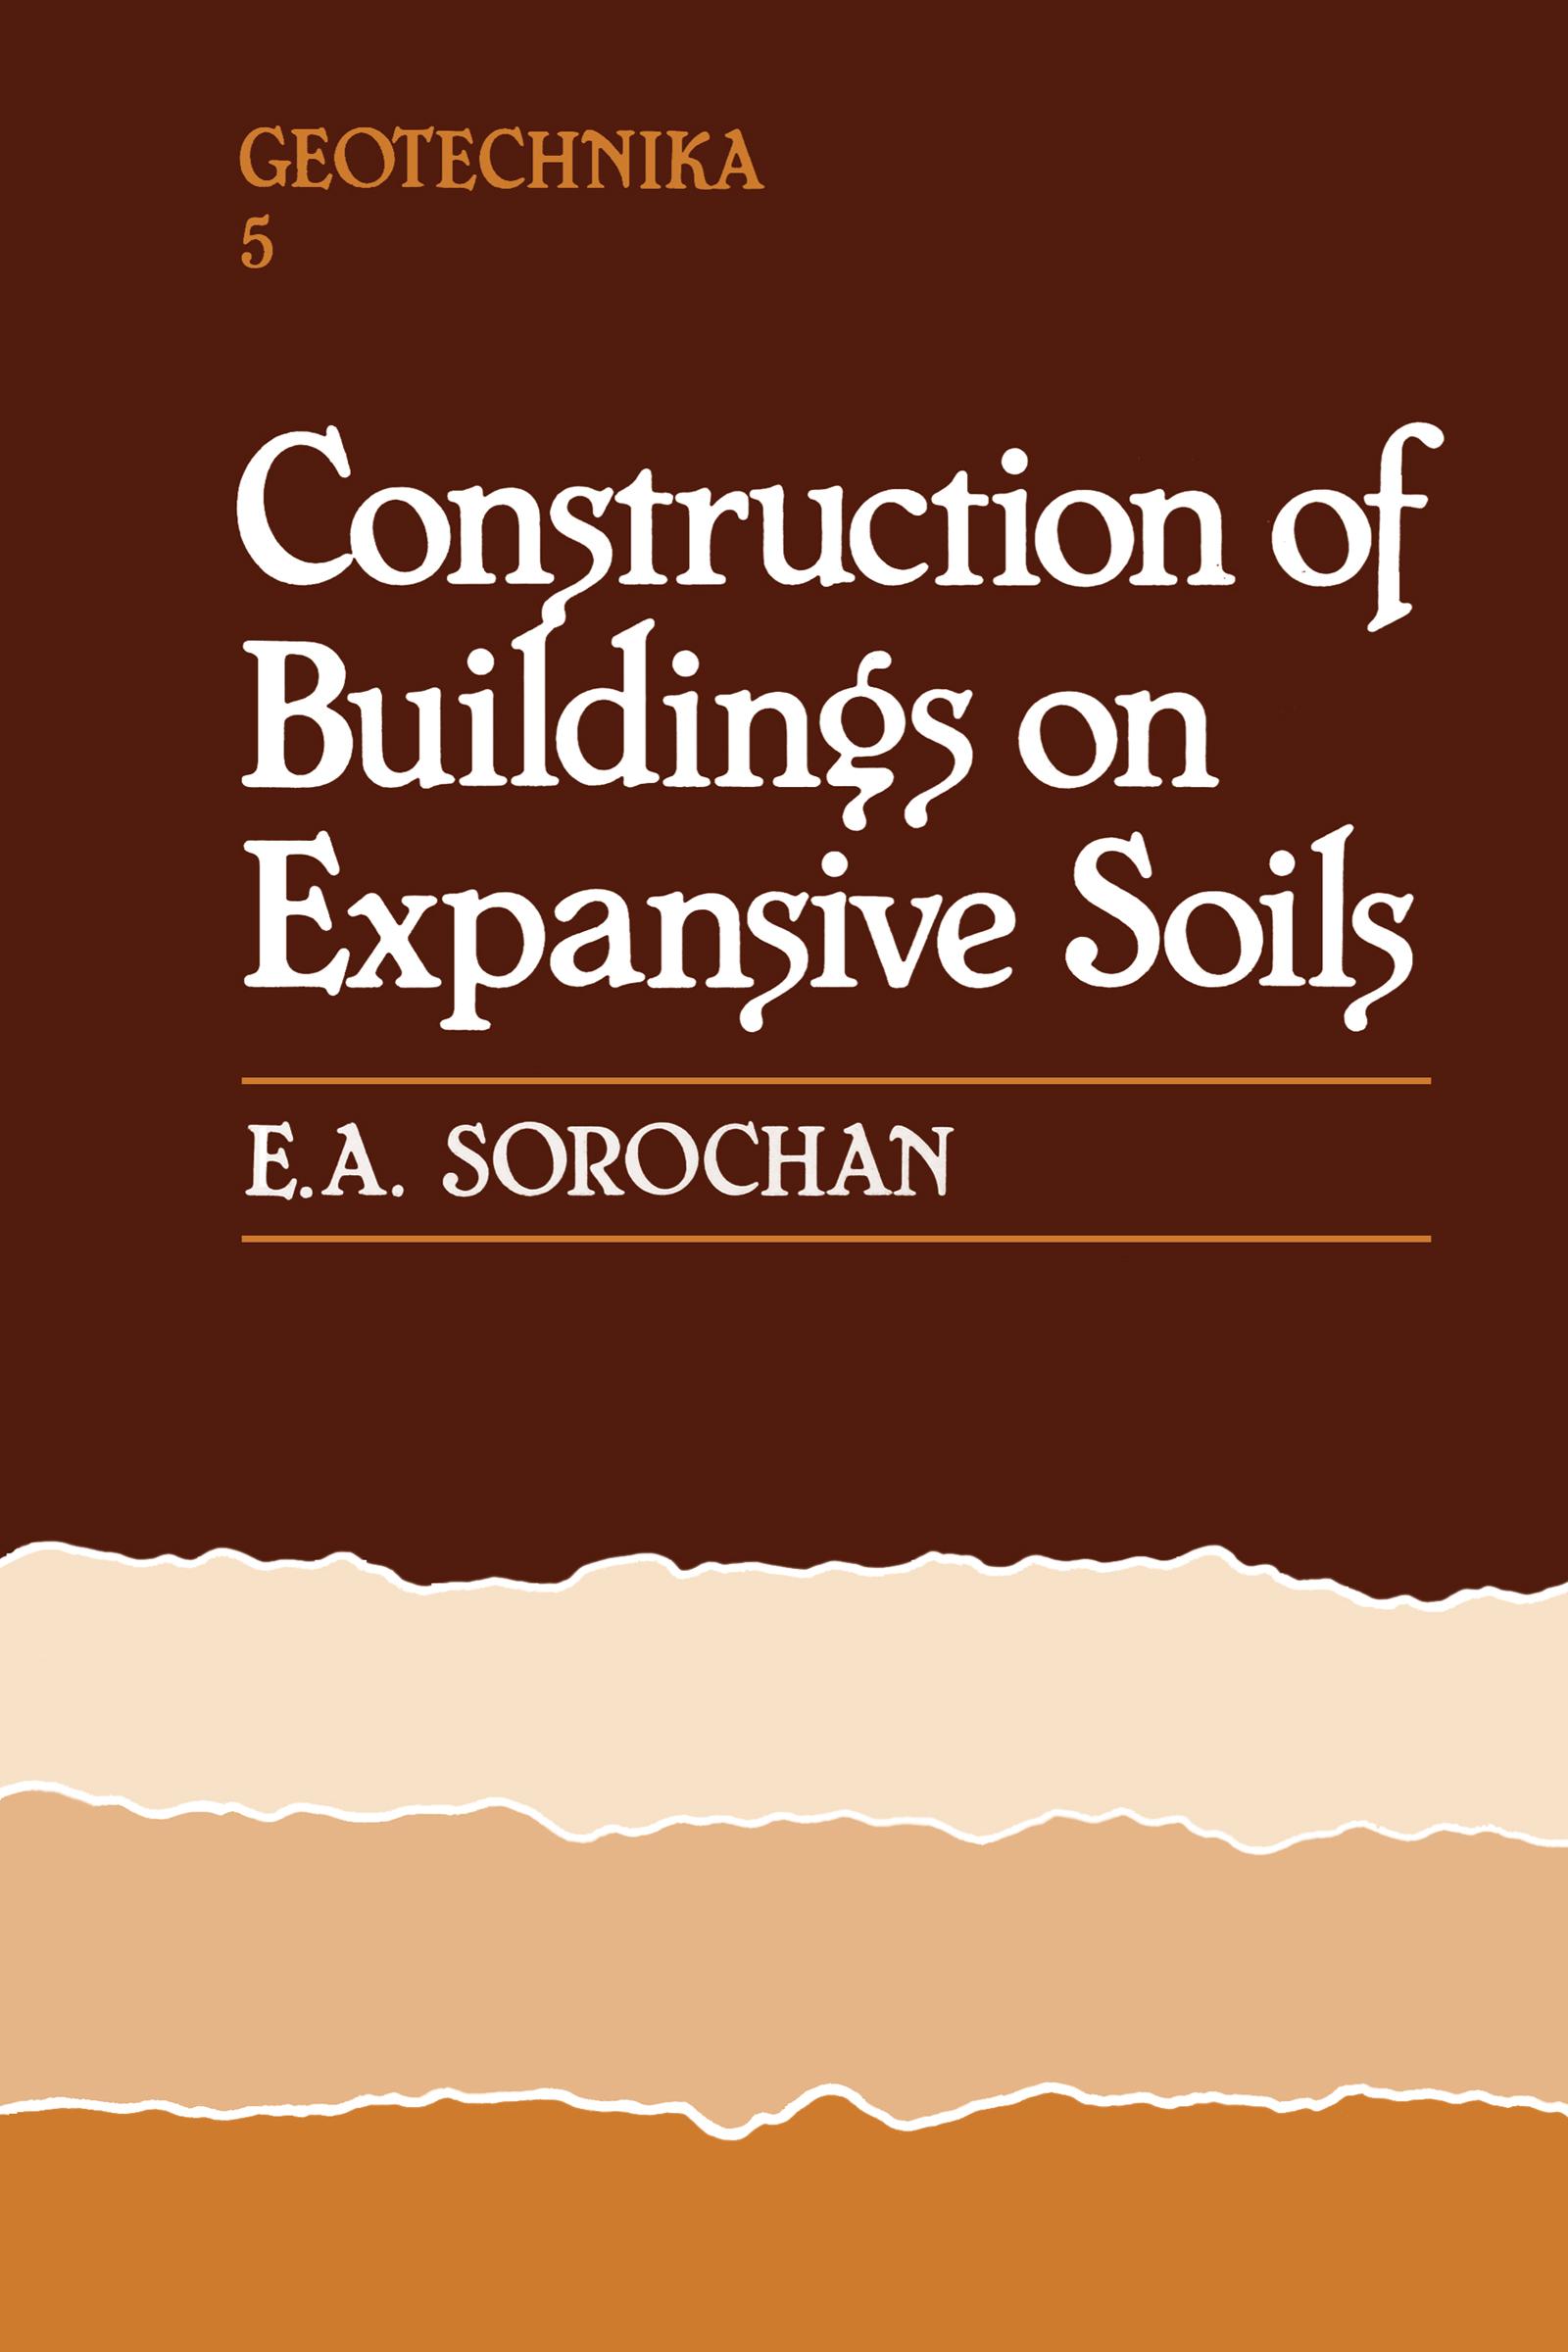 Construction of Buildings on Expansive Soils